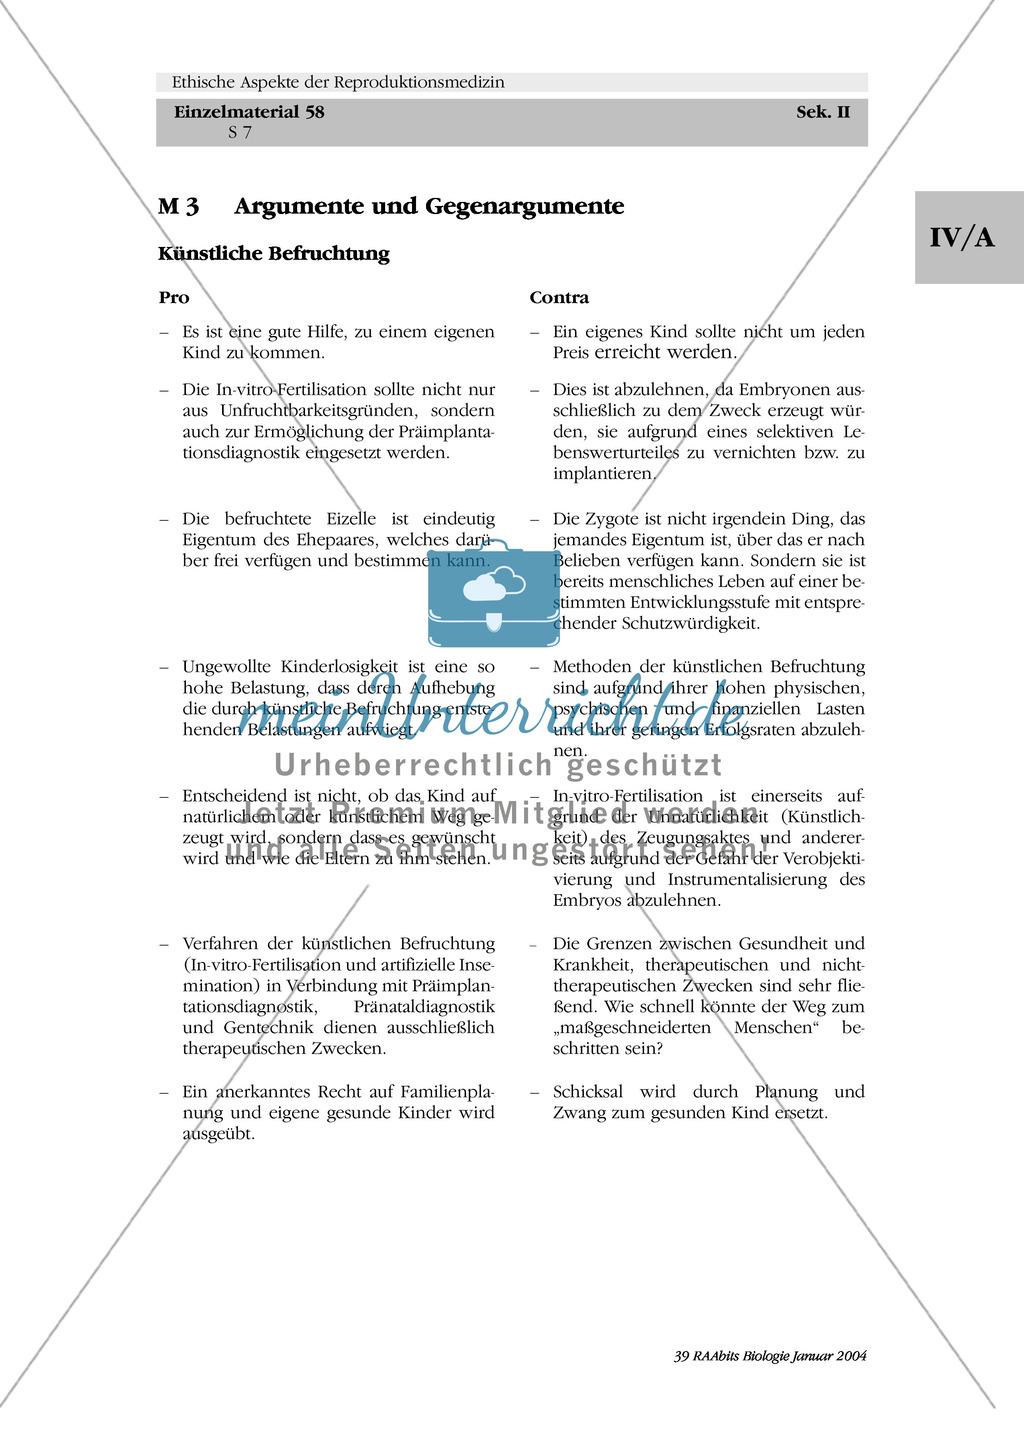 Ethische Aspekte der Reproduktionsmedizin: Pro + Contra Preview 0